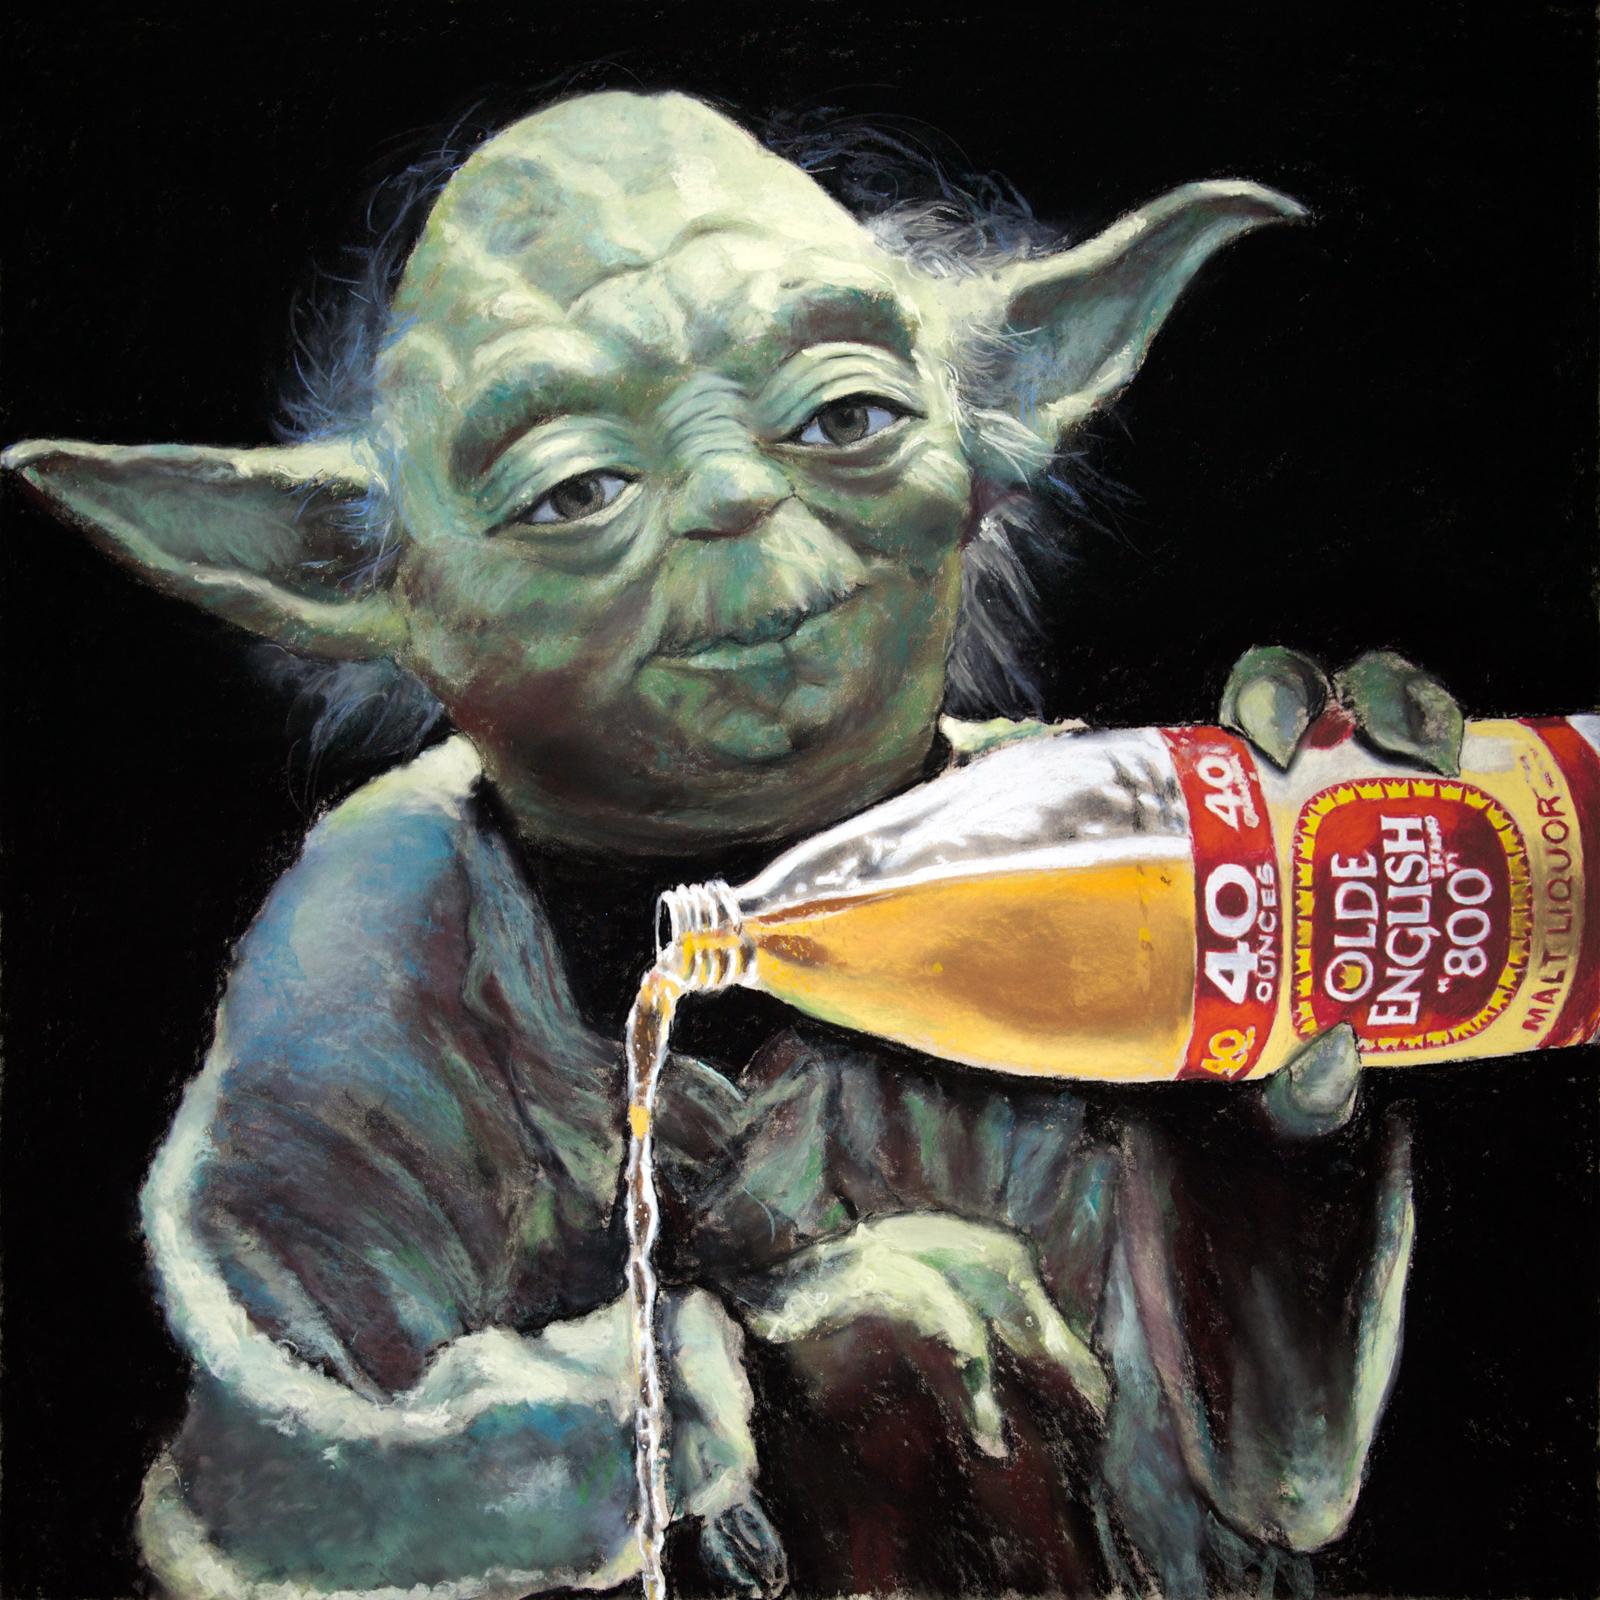 2017_Jedi_Pour_41x41.jpg